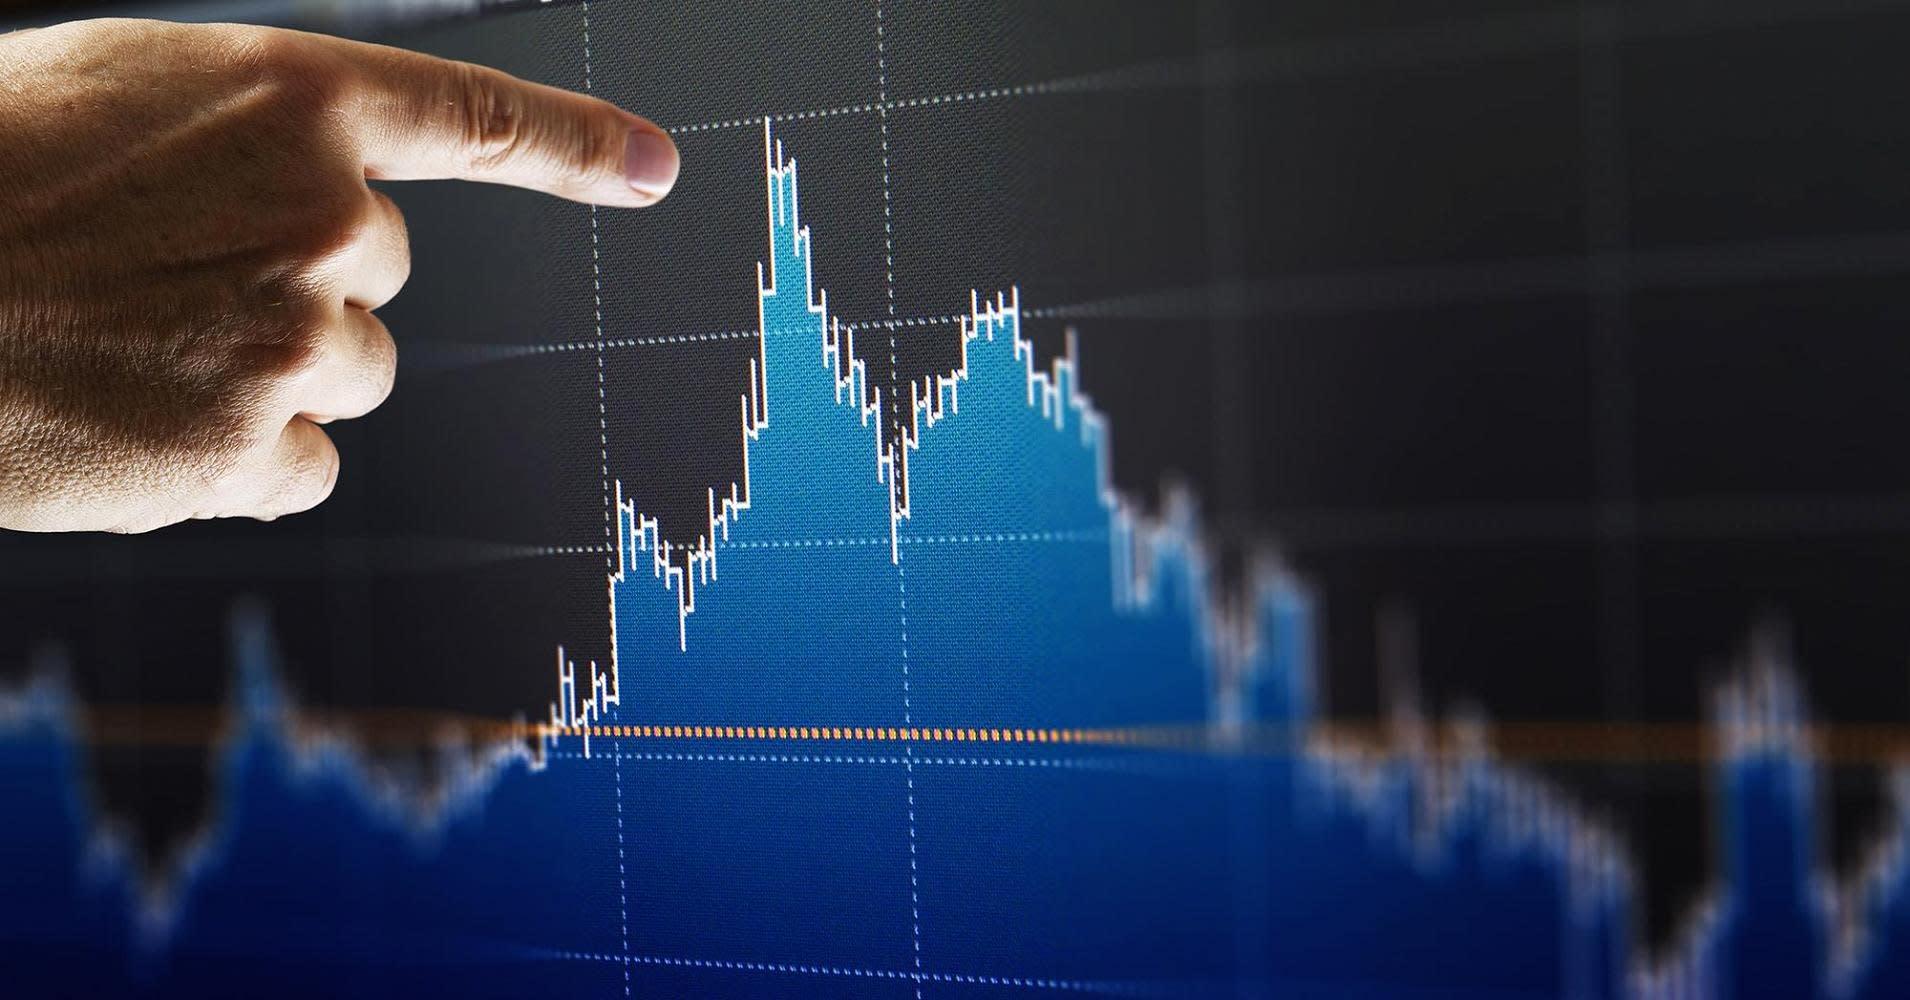 инвестиции в торговле картинки тому стоят